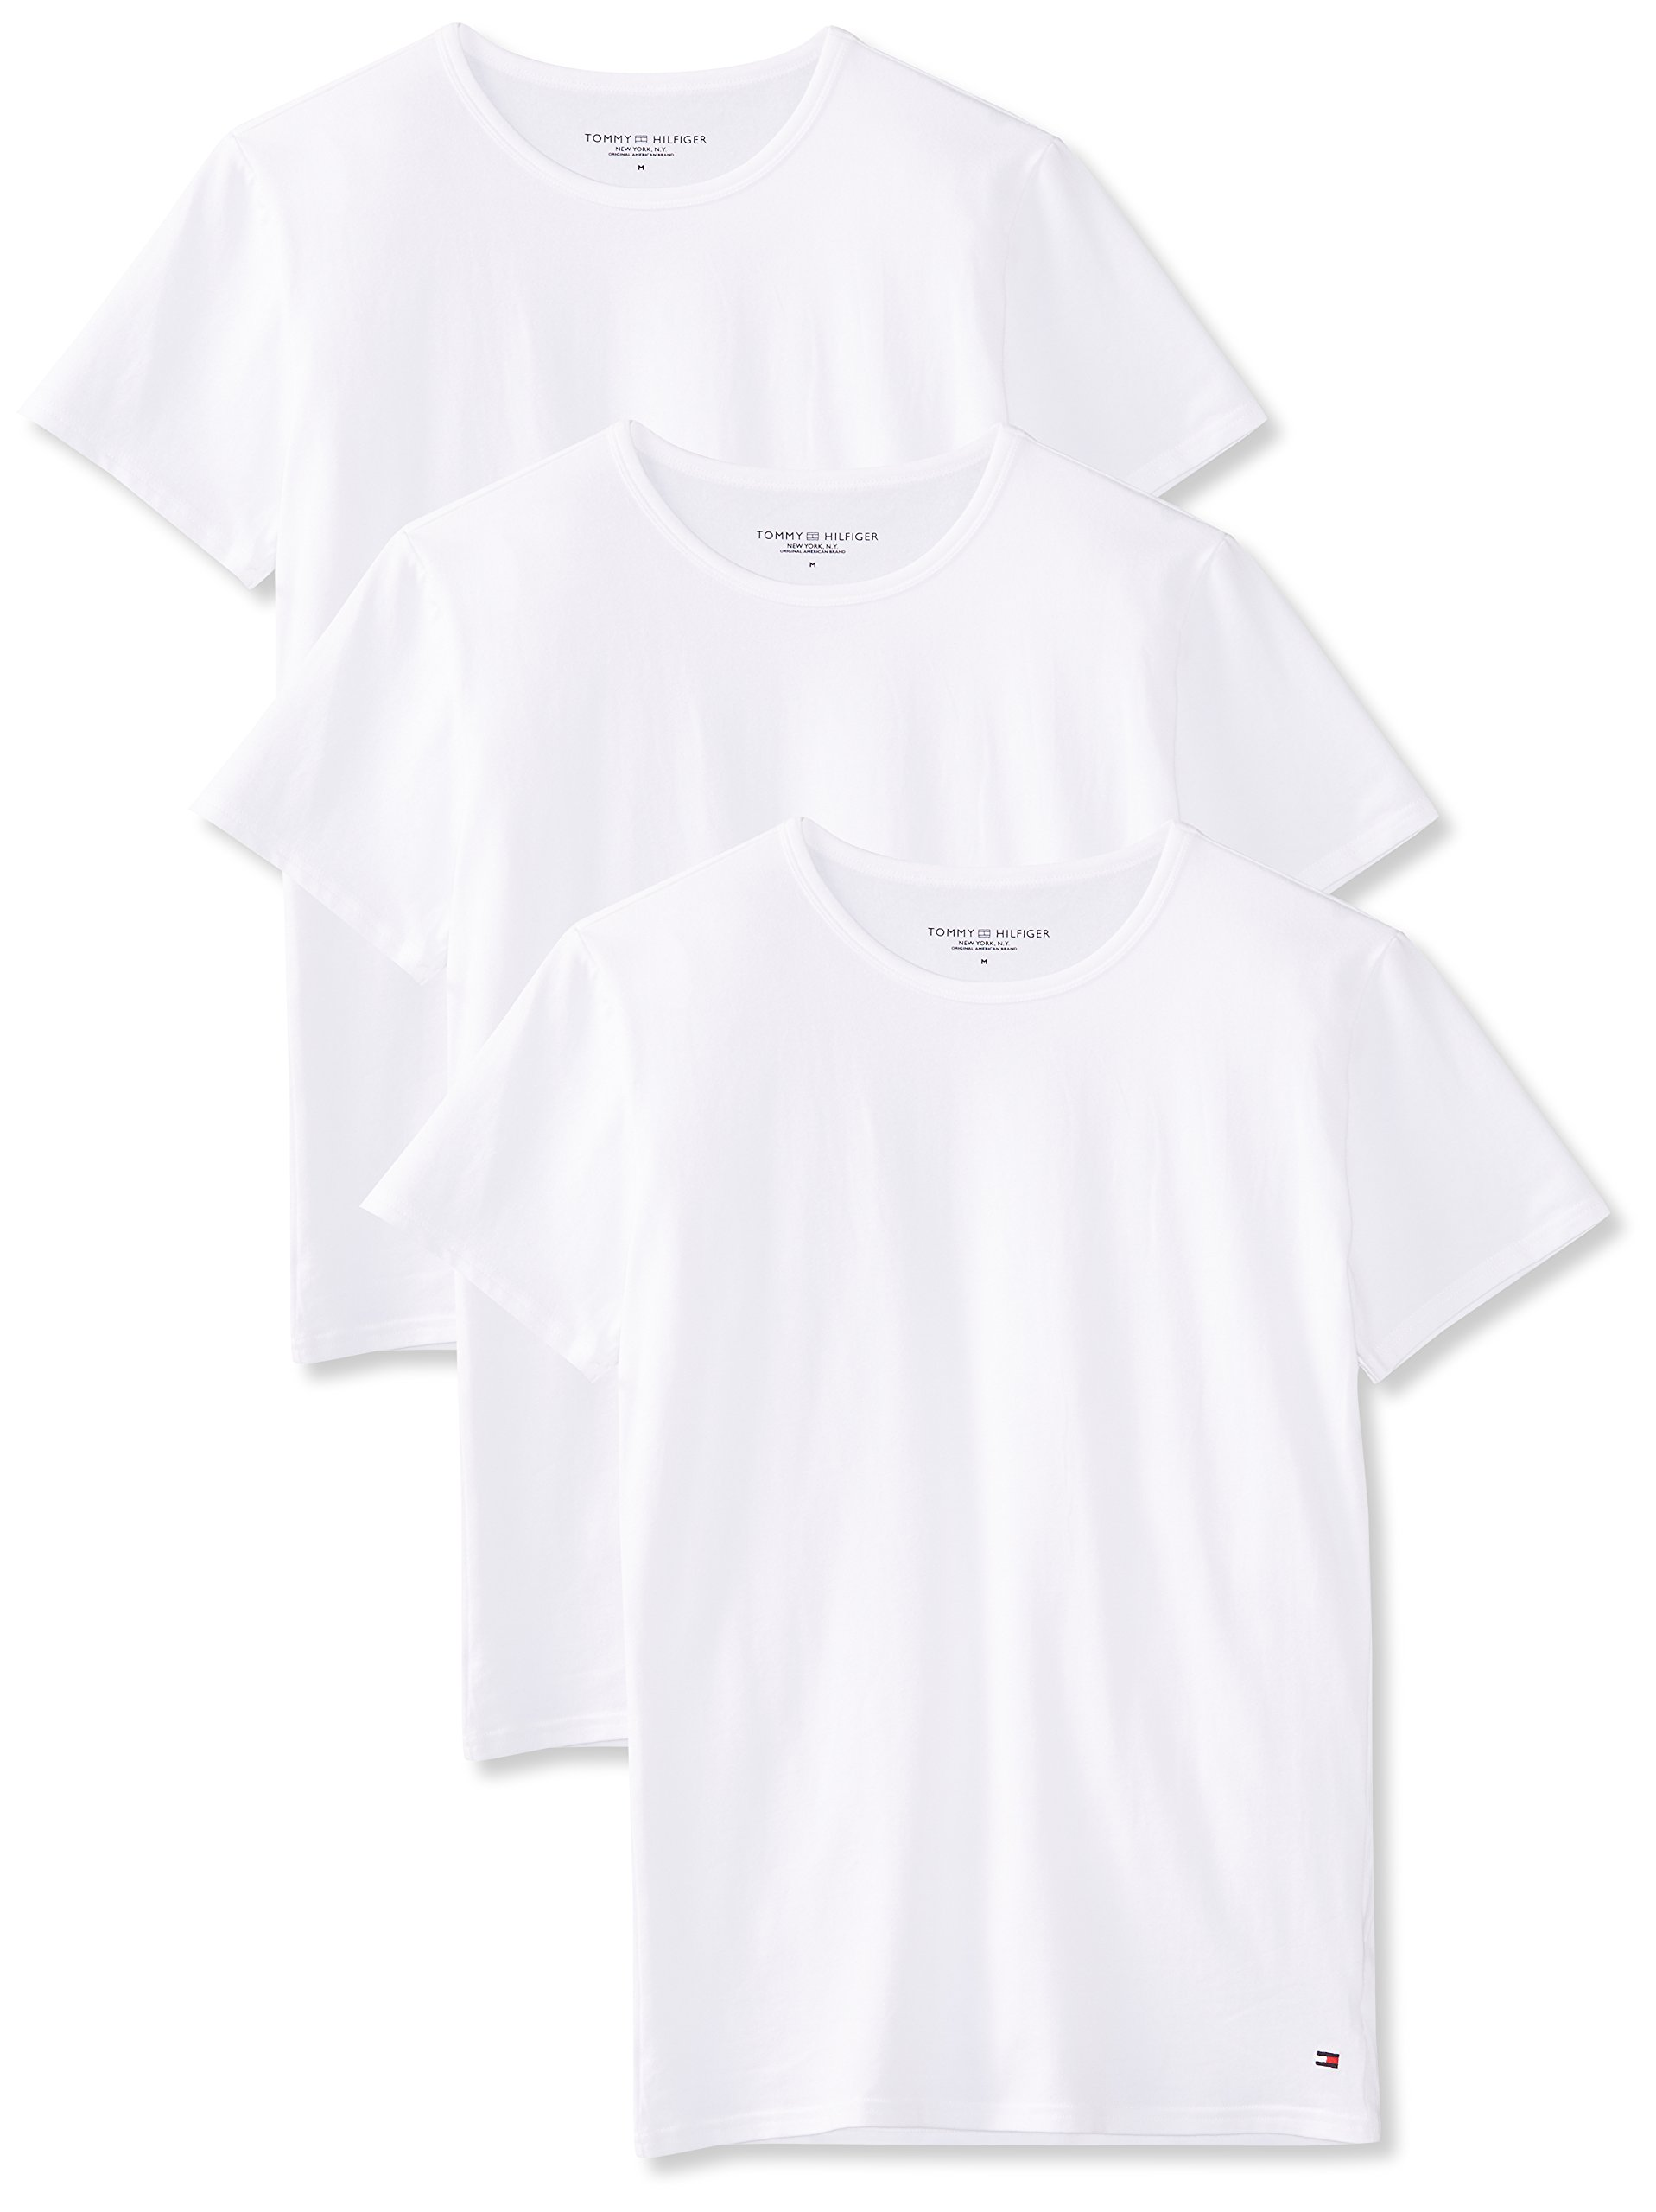 Tommy Hilfiger Camiseta (Pack de 3) para Hombre